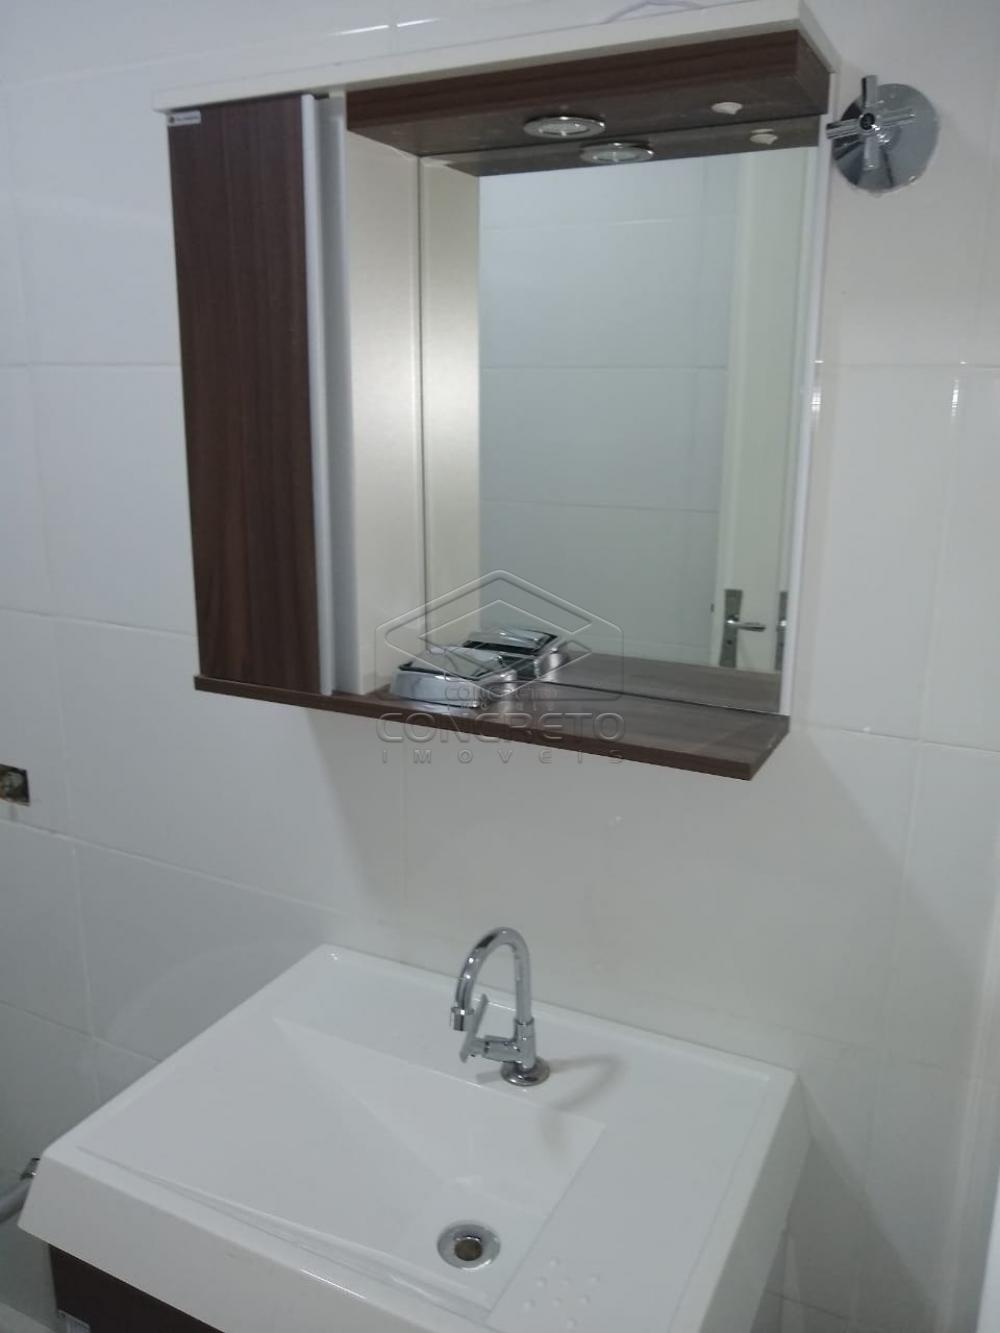 Comprar Casa / Condomínio em Bauru R$ 280.000,00 - Foto 14